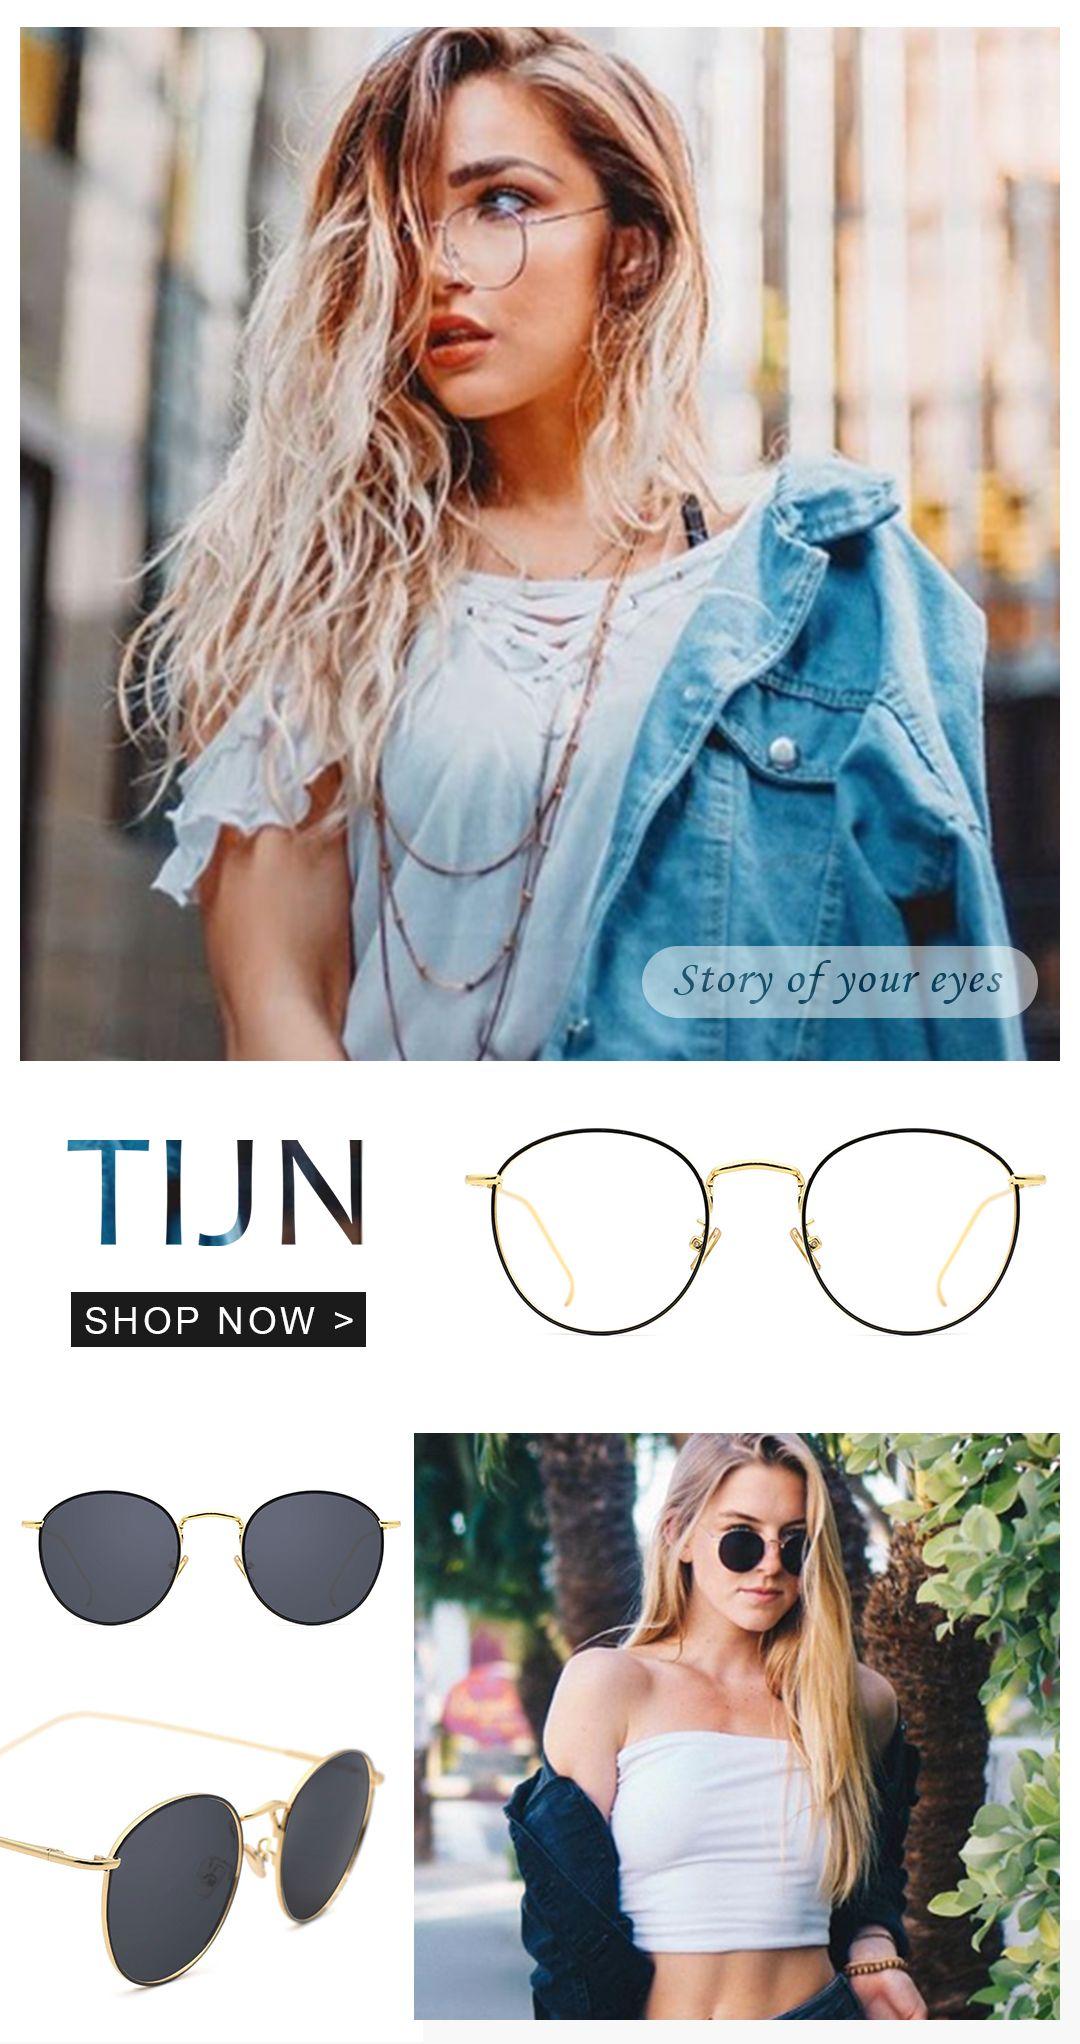 ce9847fe1d5 Most stylish eye-wear 2018 summer